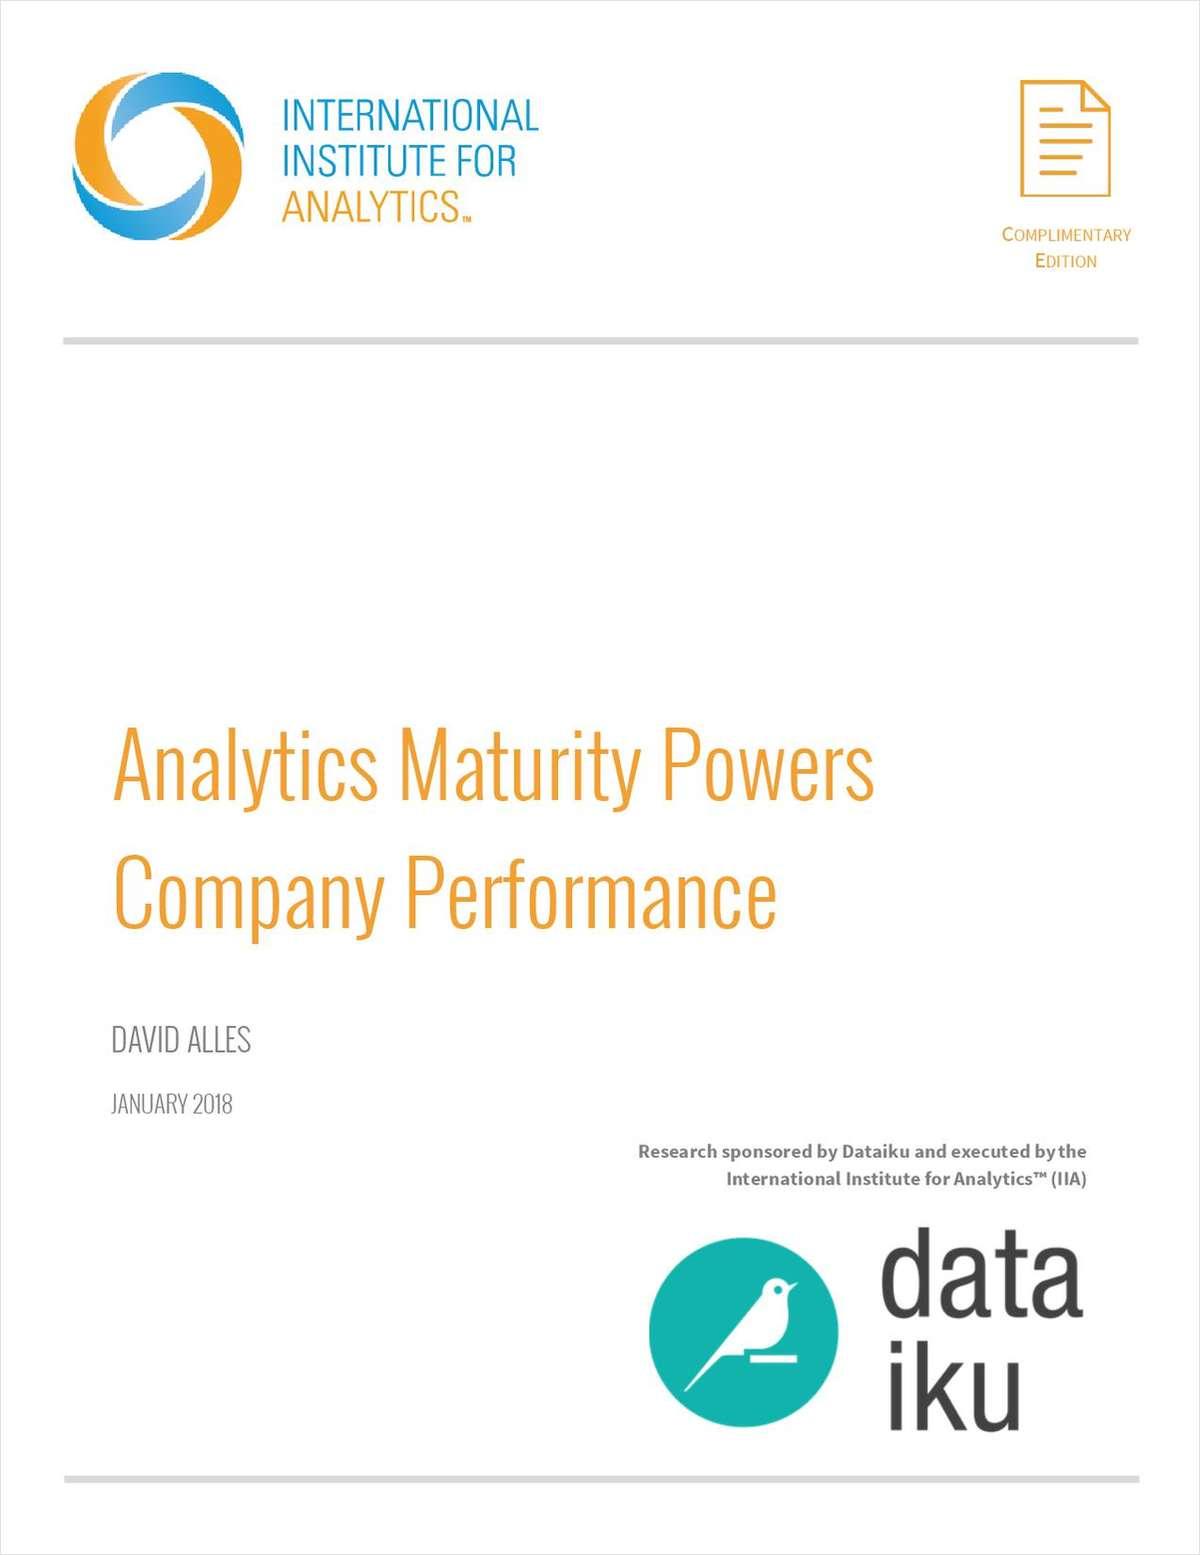 Analytics Maturity Powers Company Performance